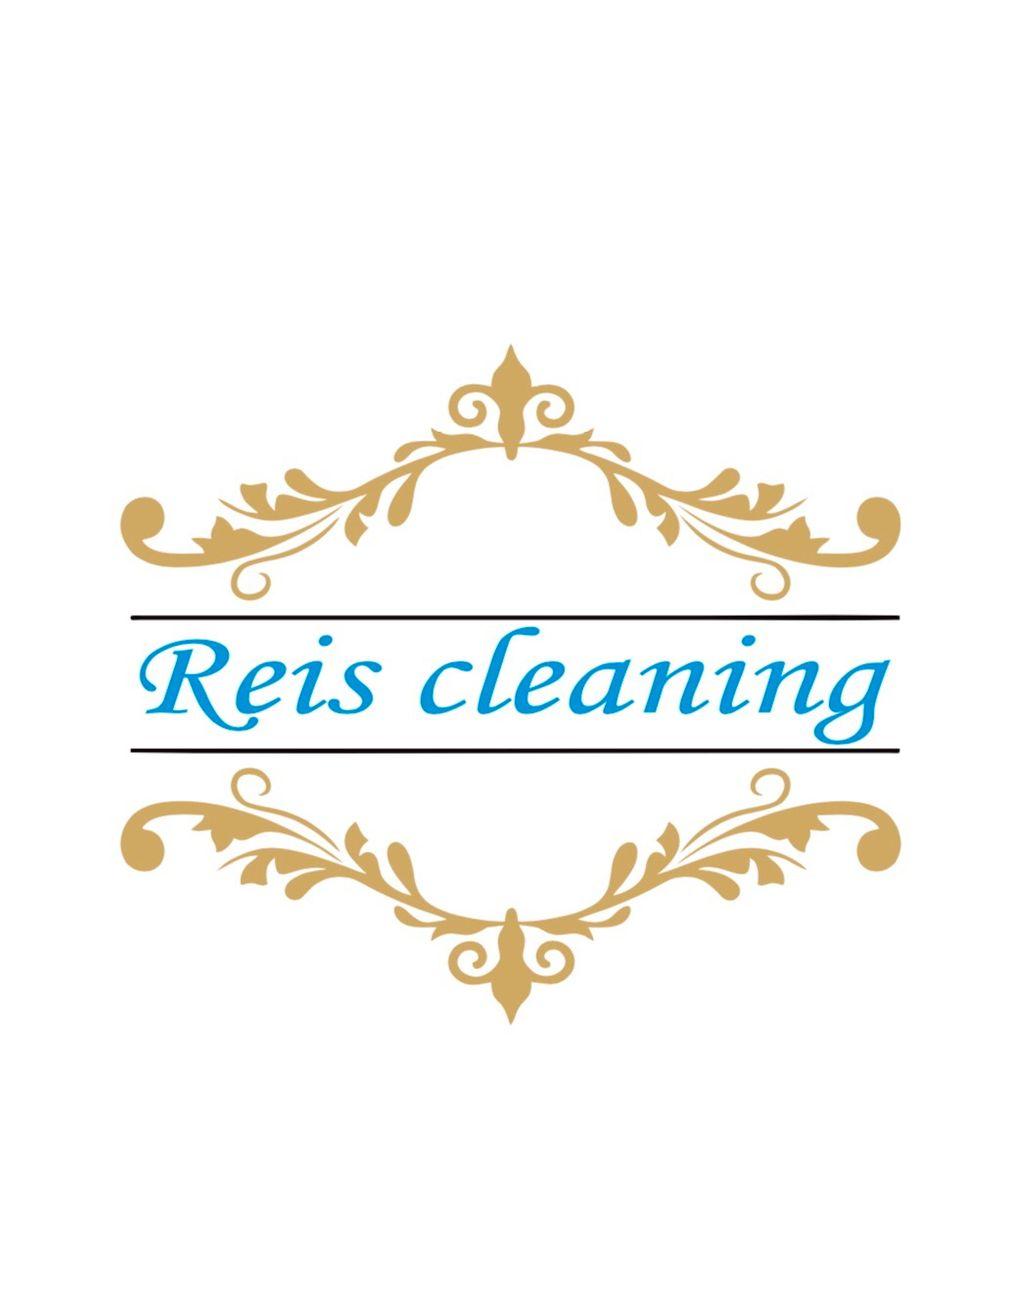 Reis cleaning